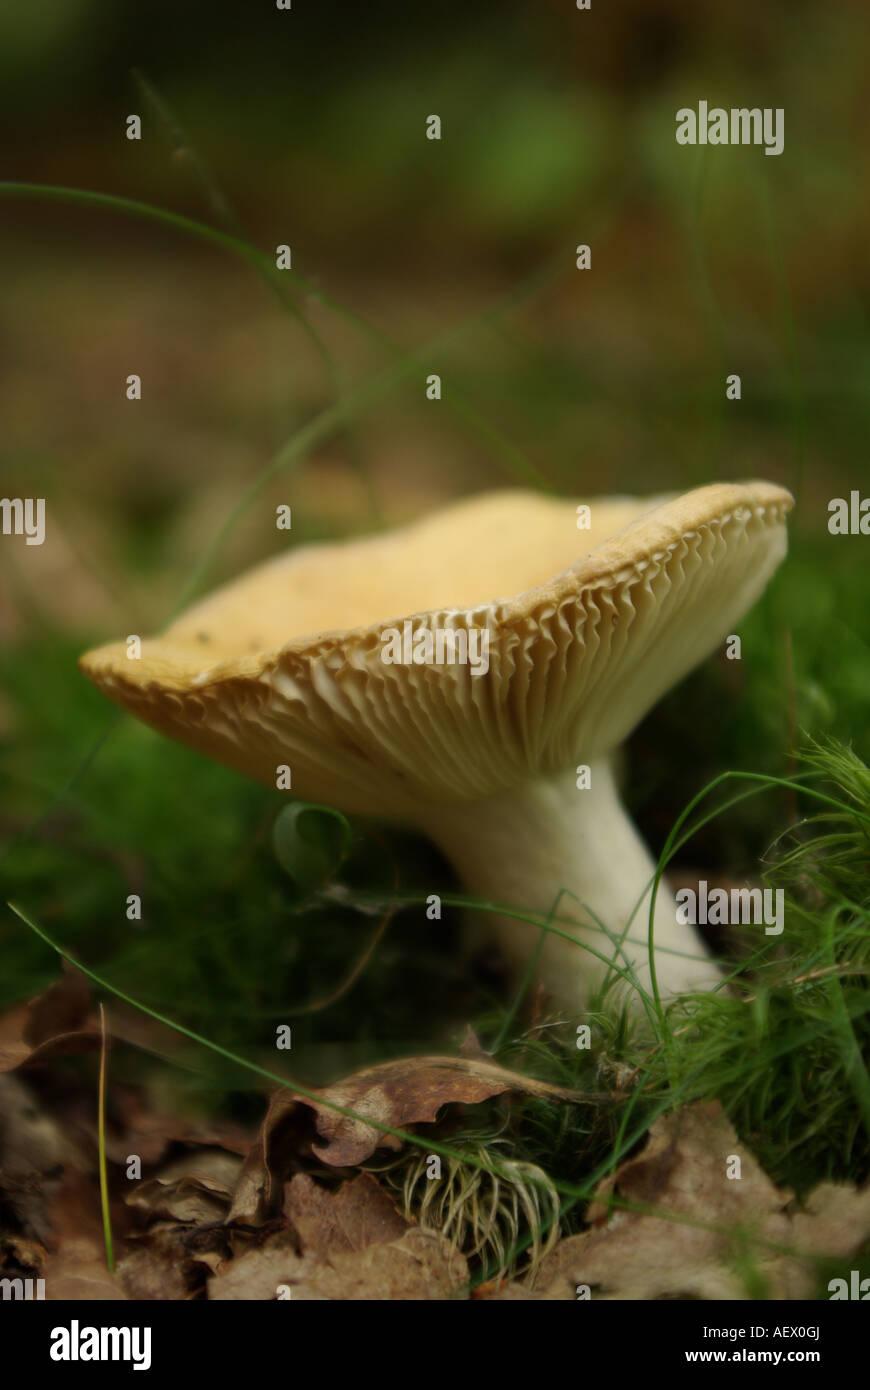 Mushroom in Autumn woodlands - Stock Image